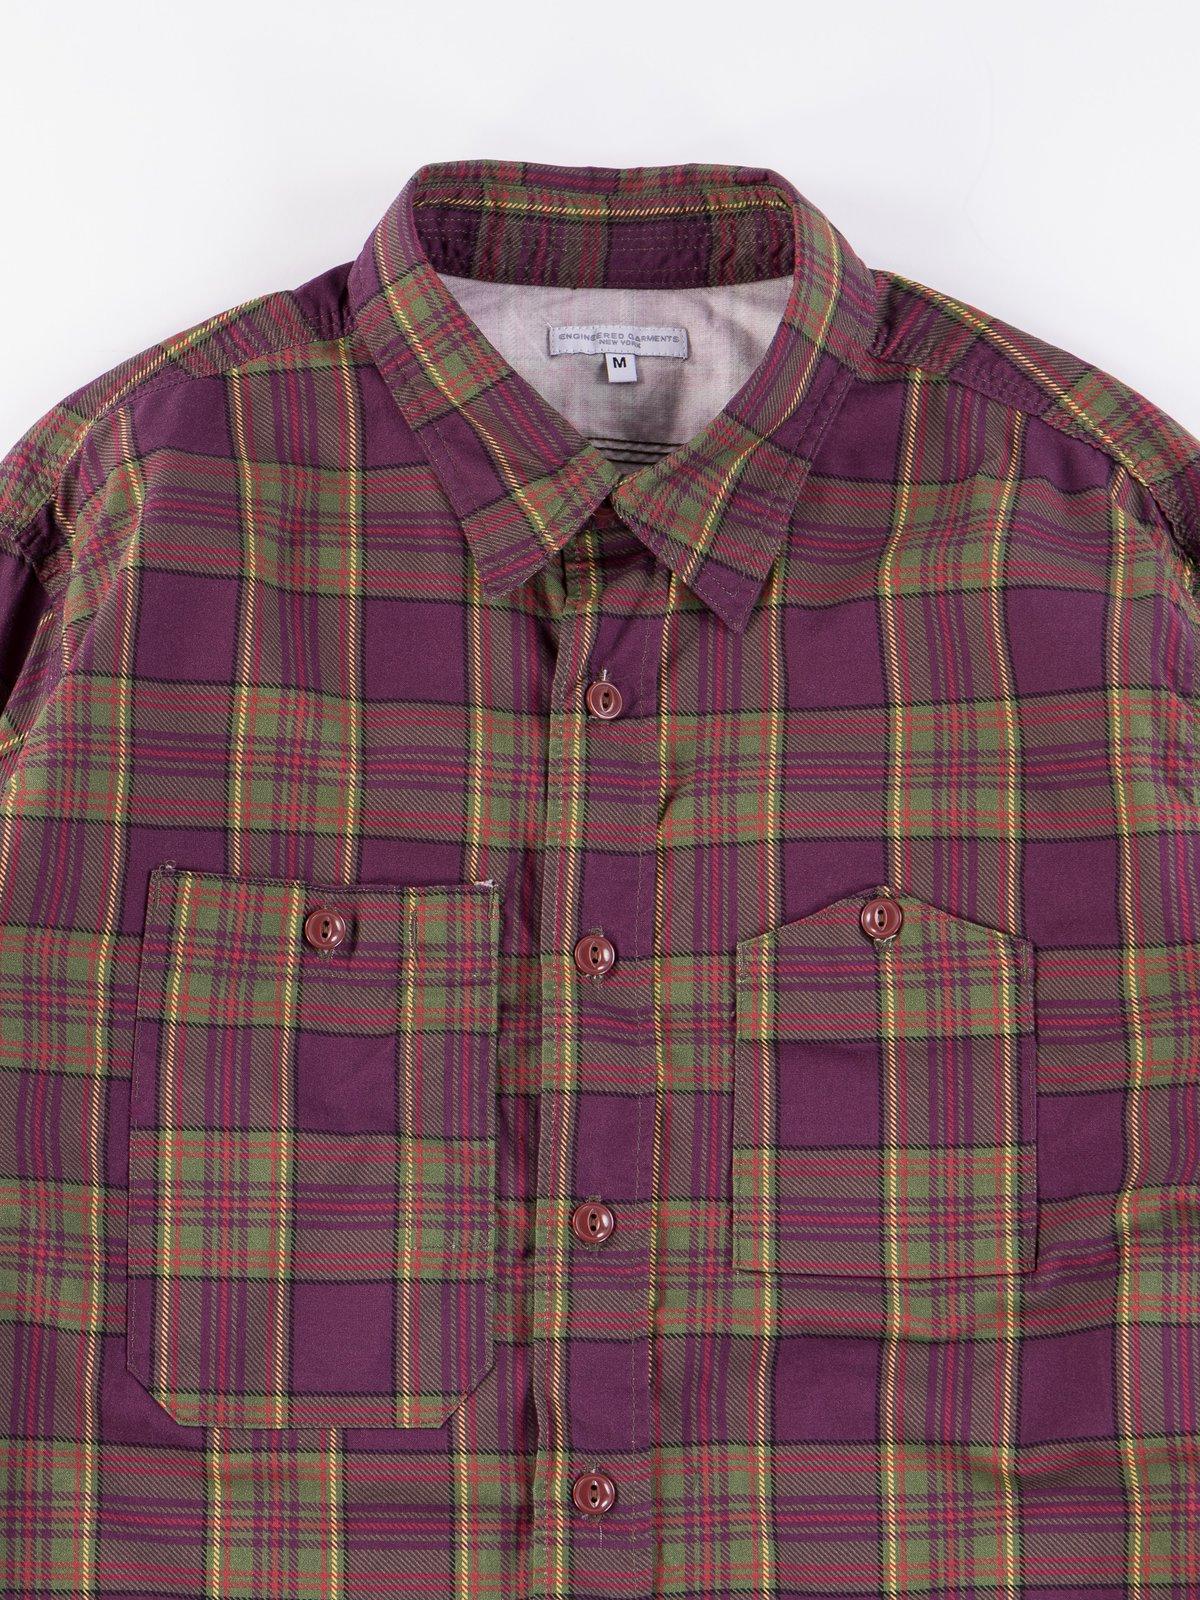 Purple/Green Cotton Printed Plaid Work Shirt - Image 4